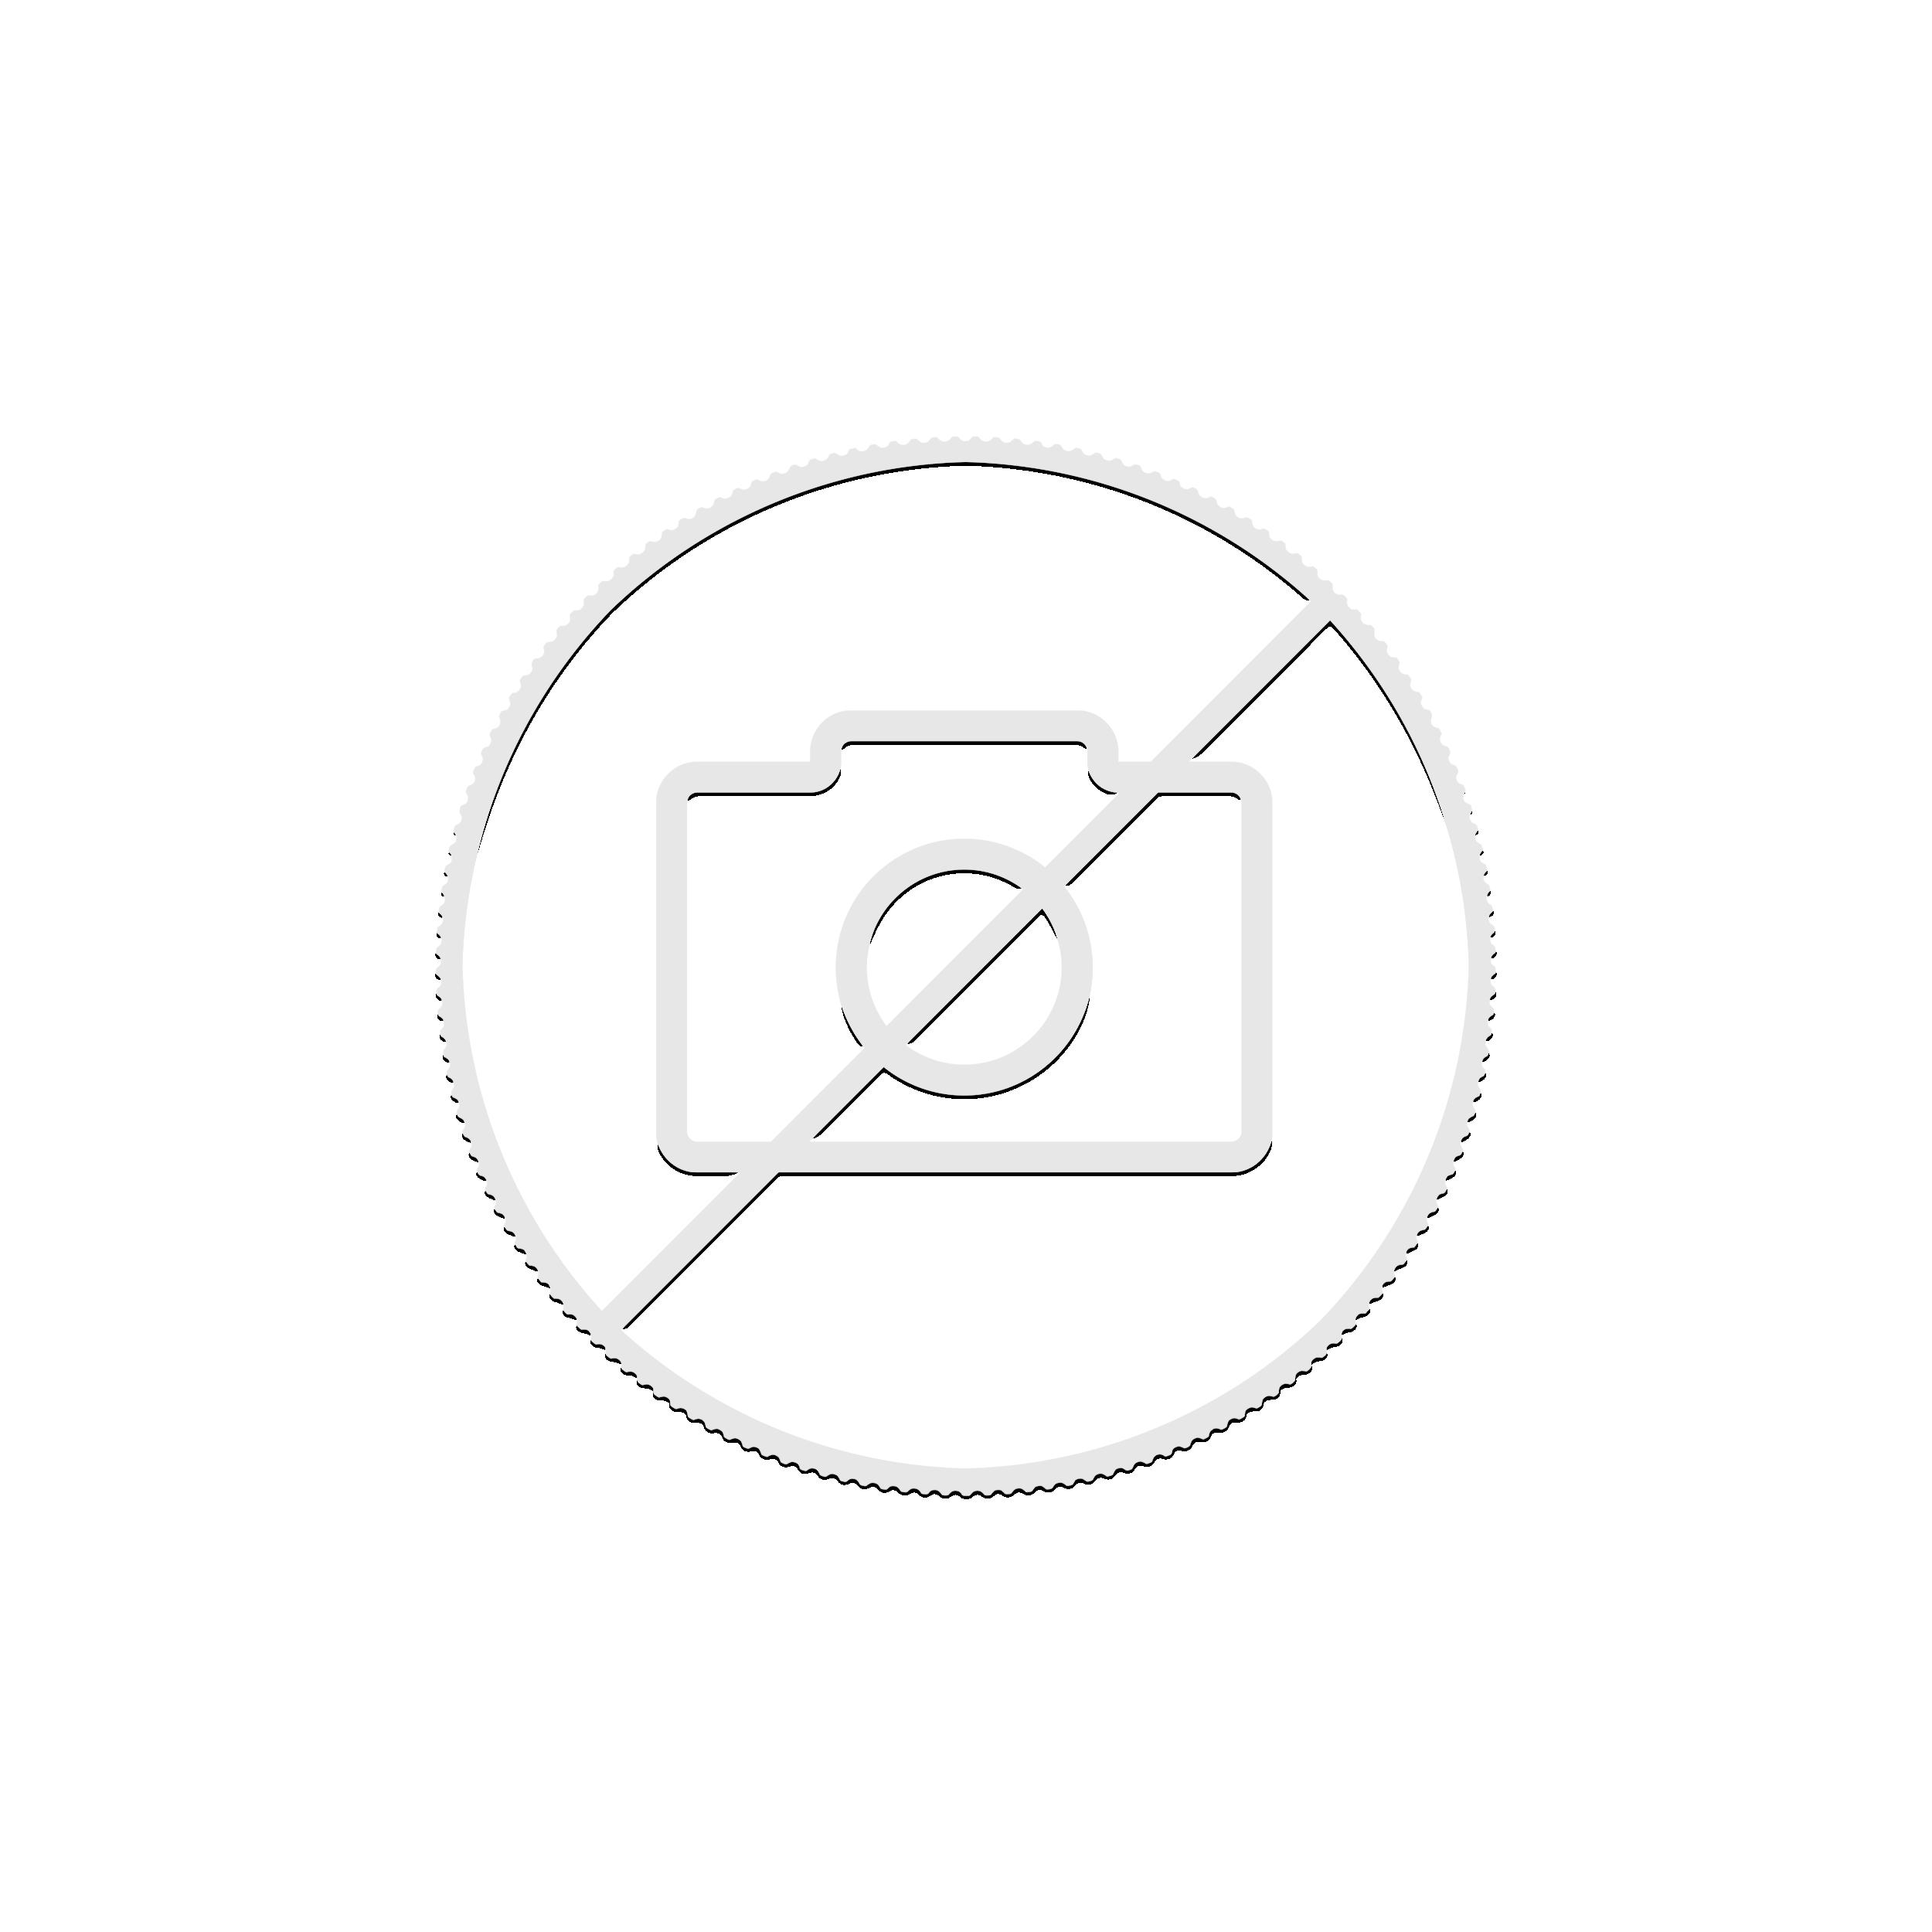 10 troy ounce silver Koala coin 2014